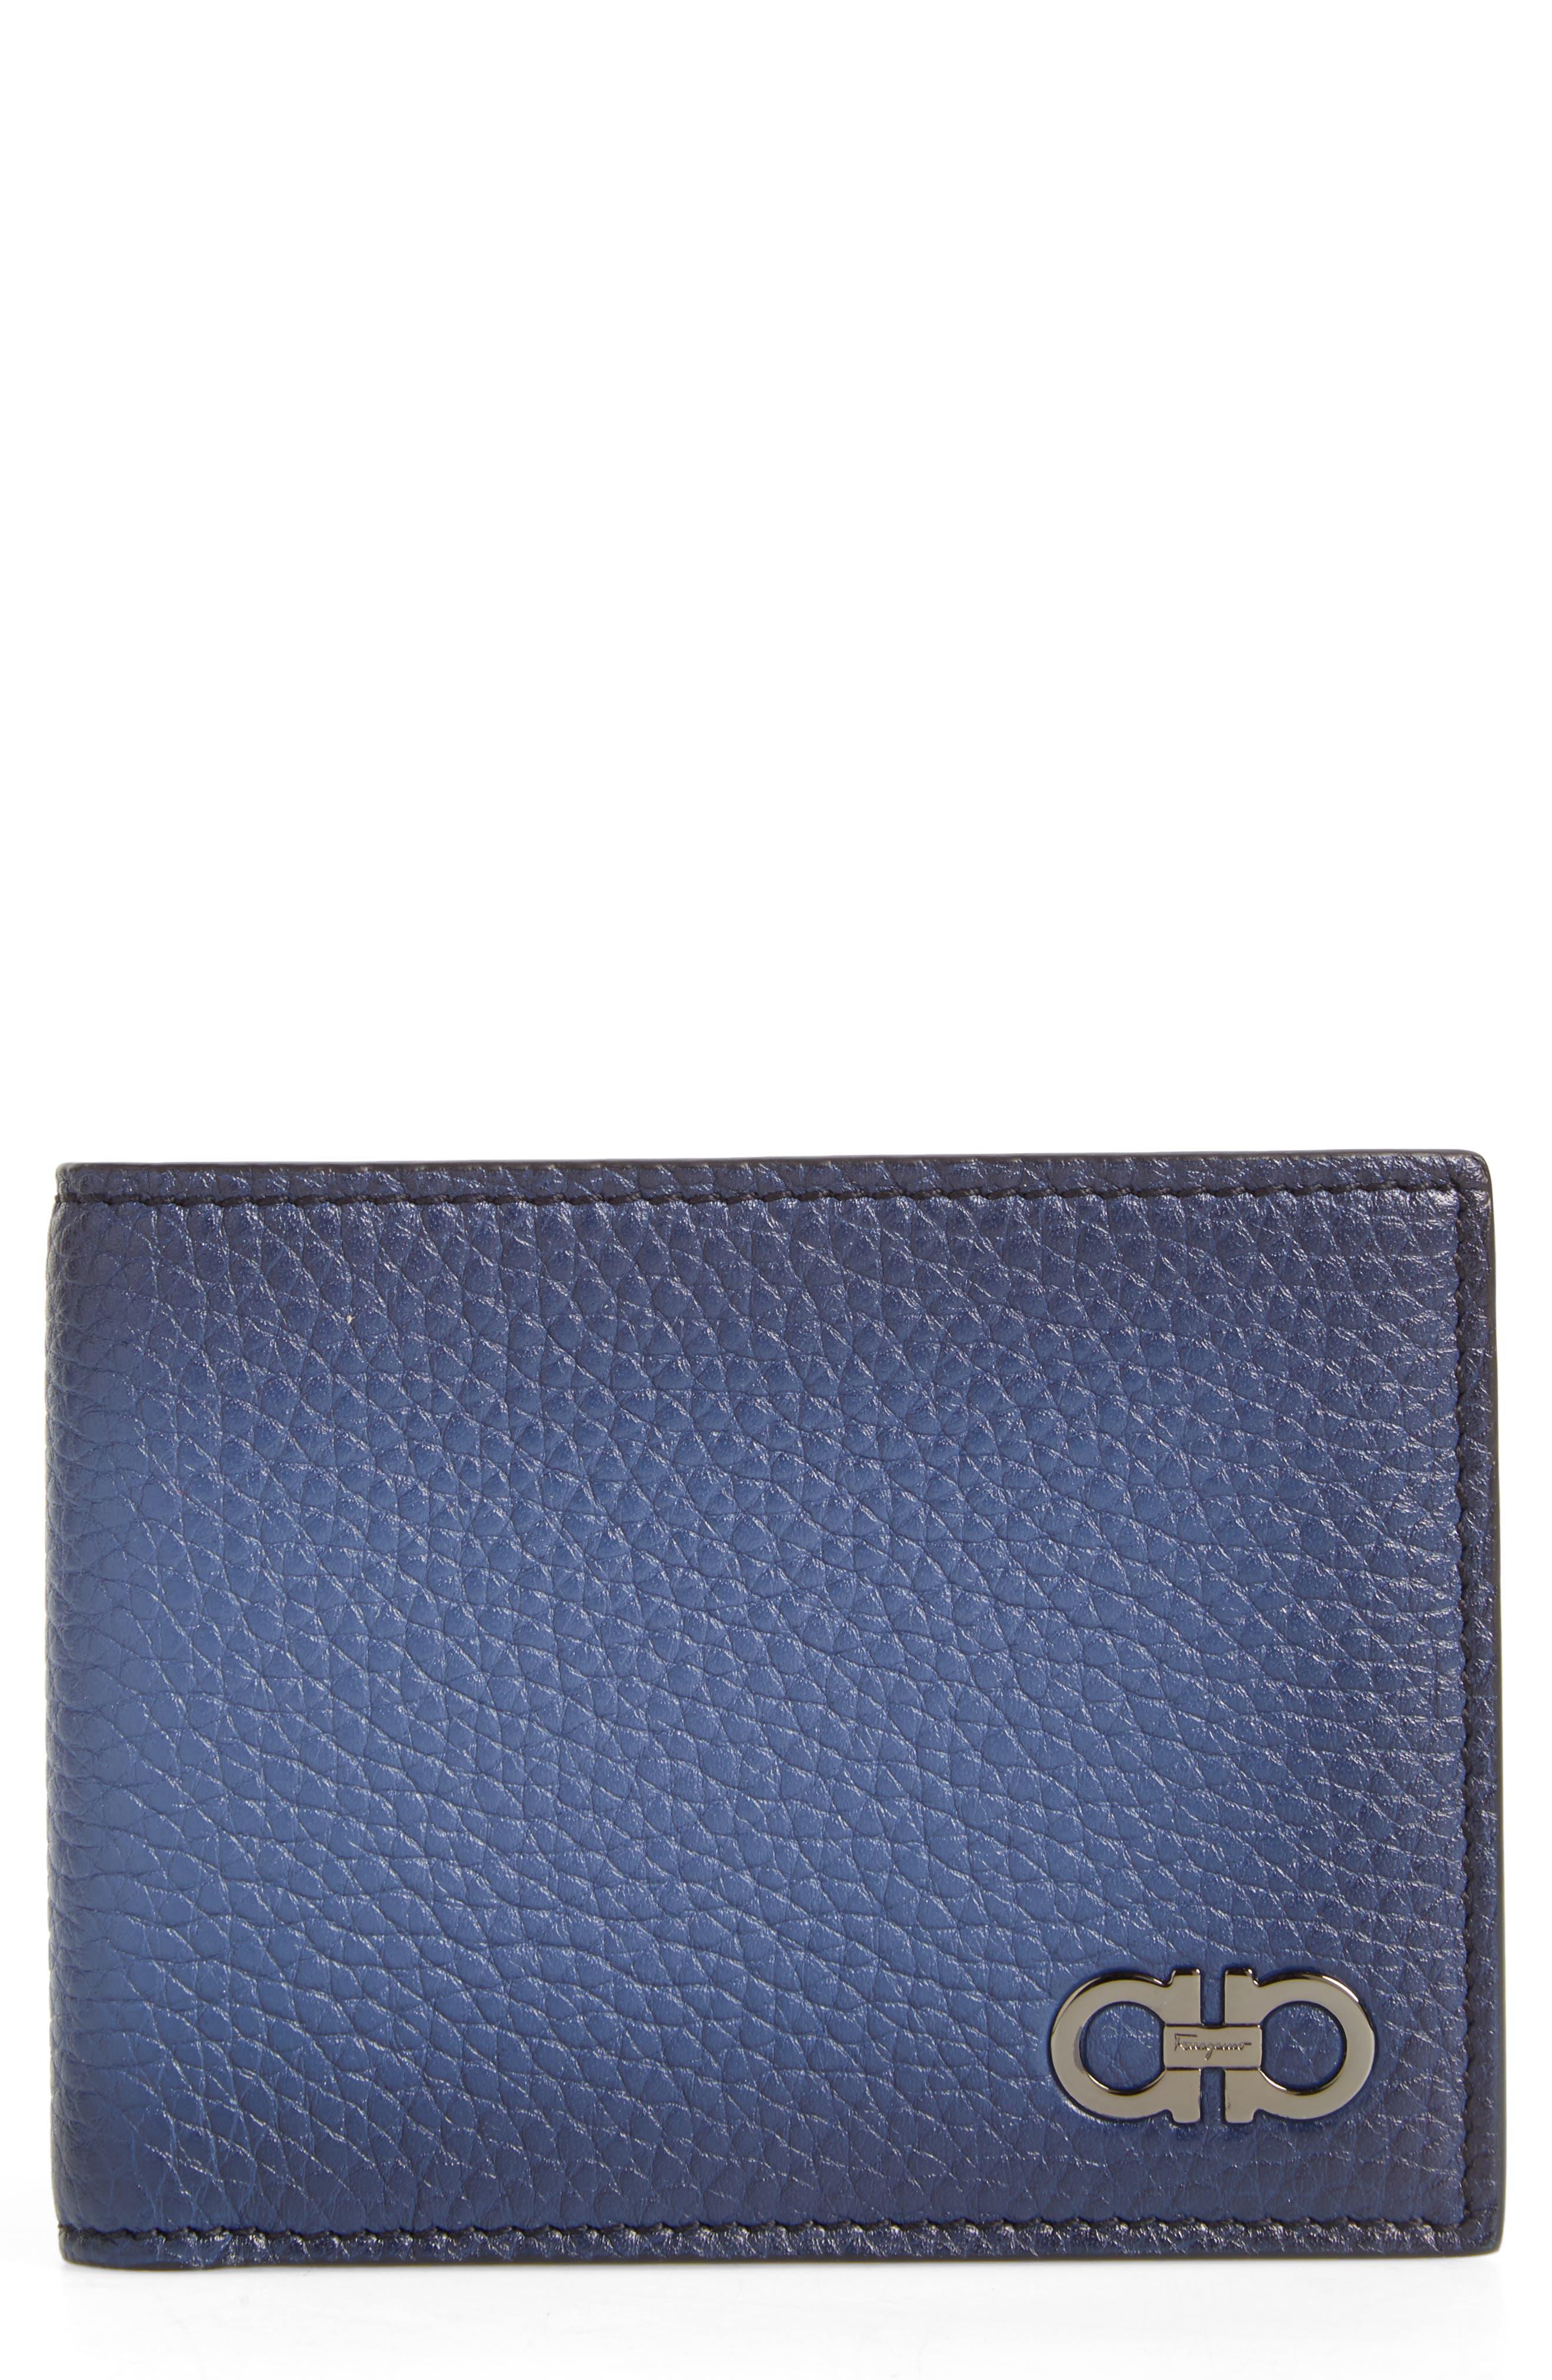 Firenze Glow Calfskin Leather Bifold Wallet,                             Main thumbnail 1, color,